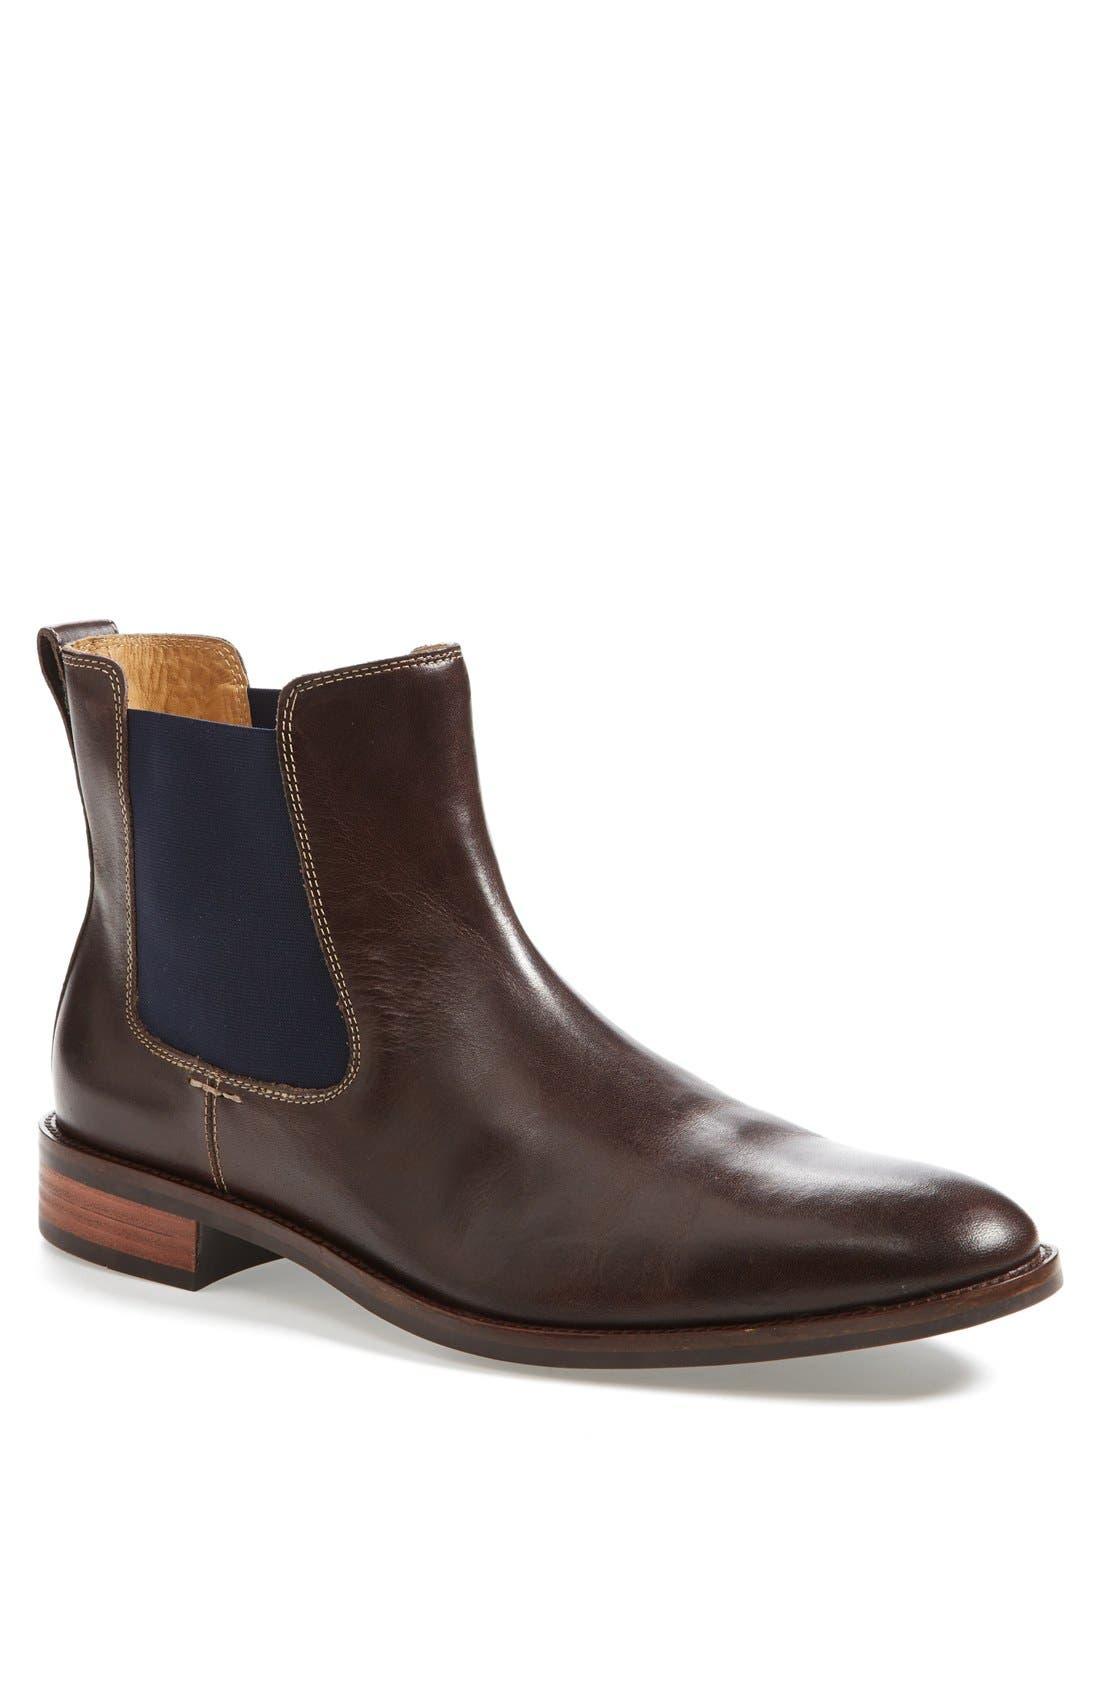 Alternate Image 1 Selected - Cole Haan 'Lenox Hill' Chelsea Boot (Men)